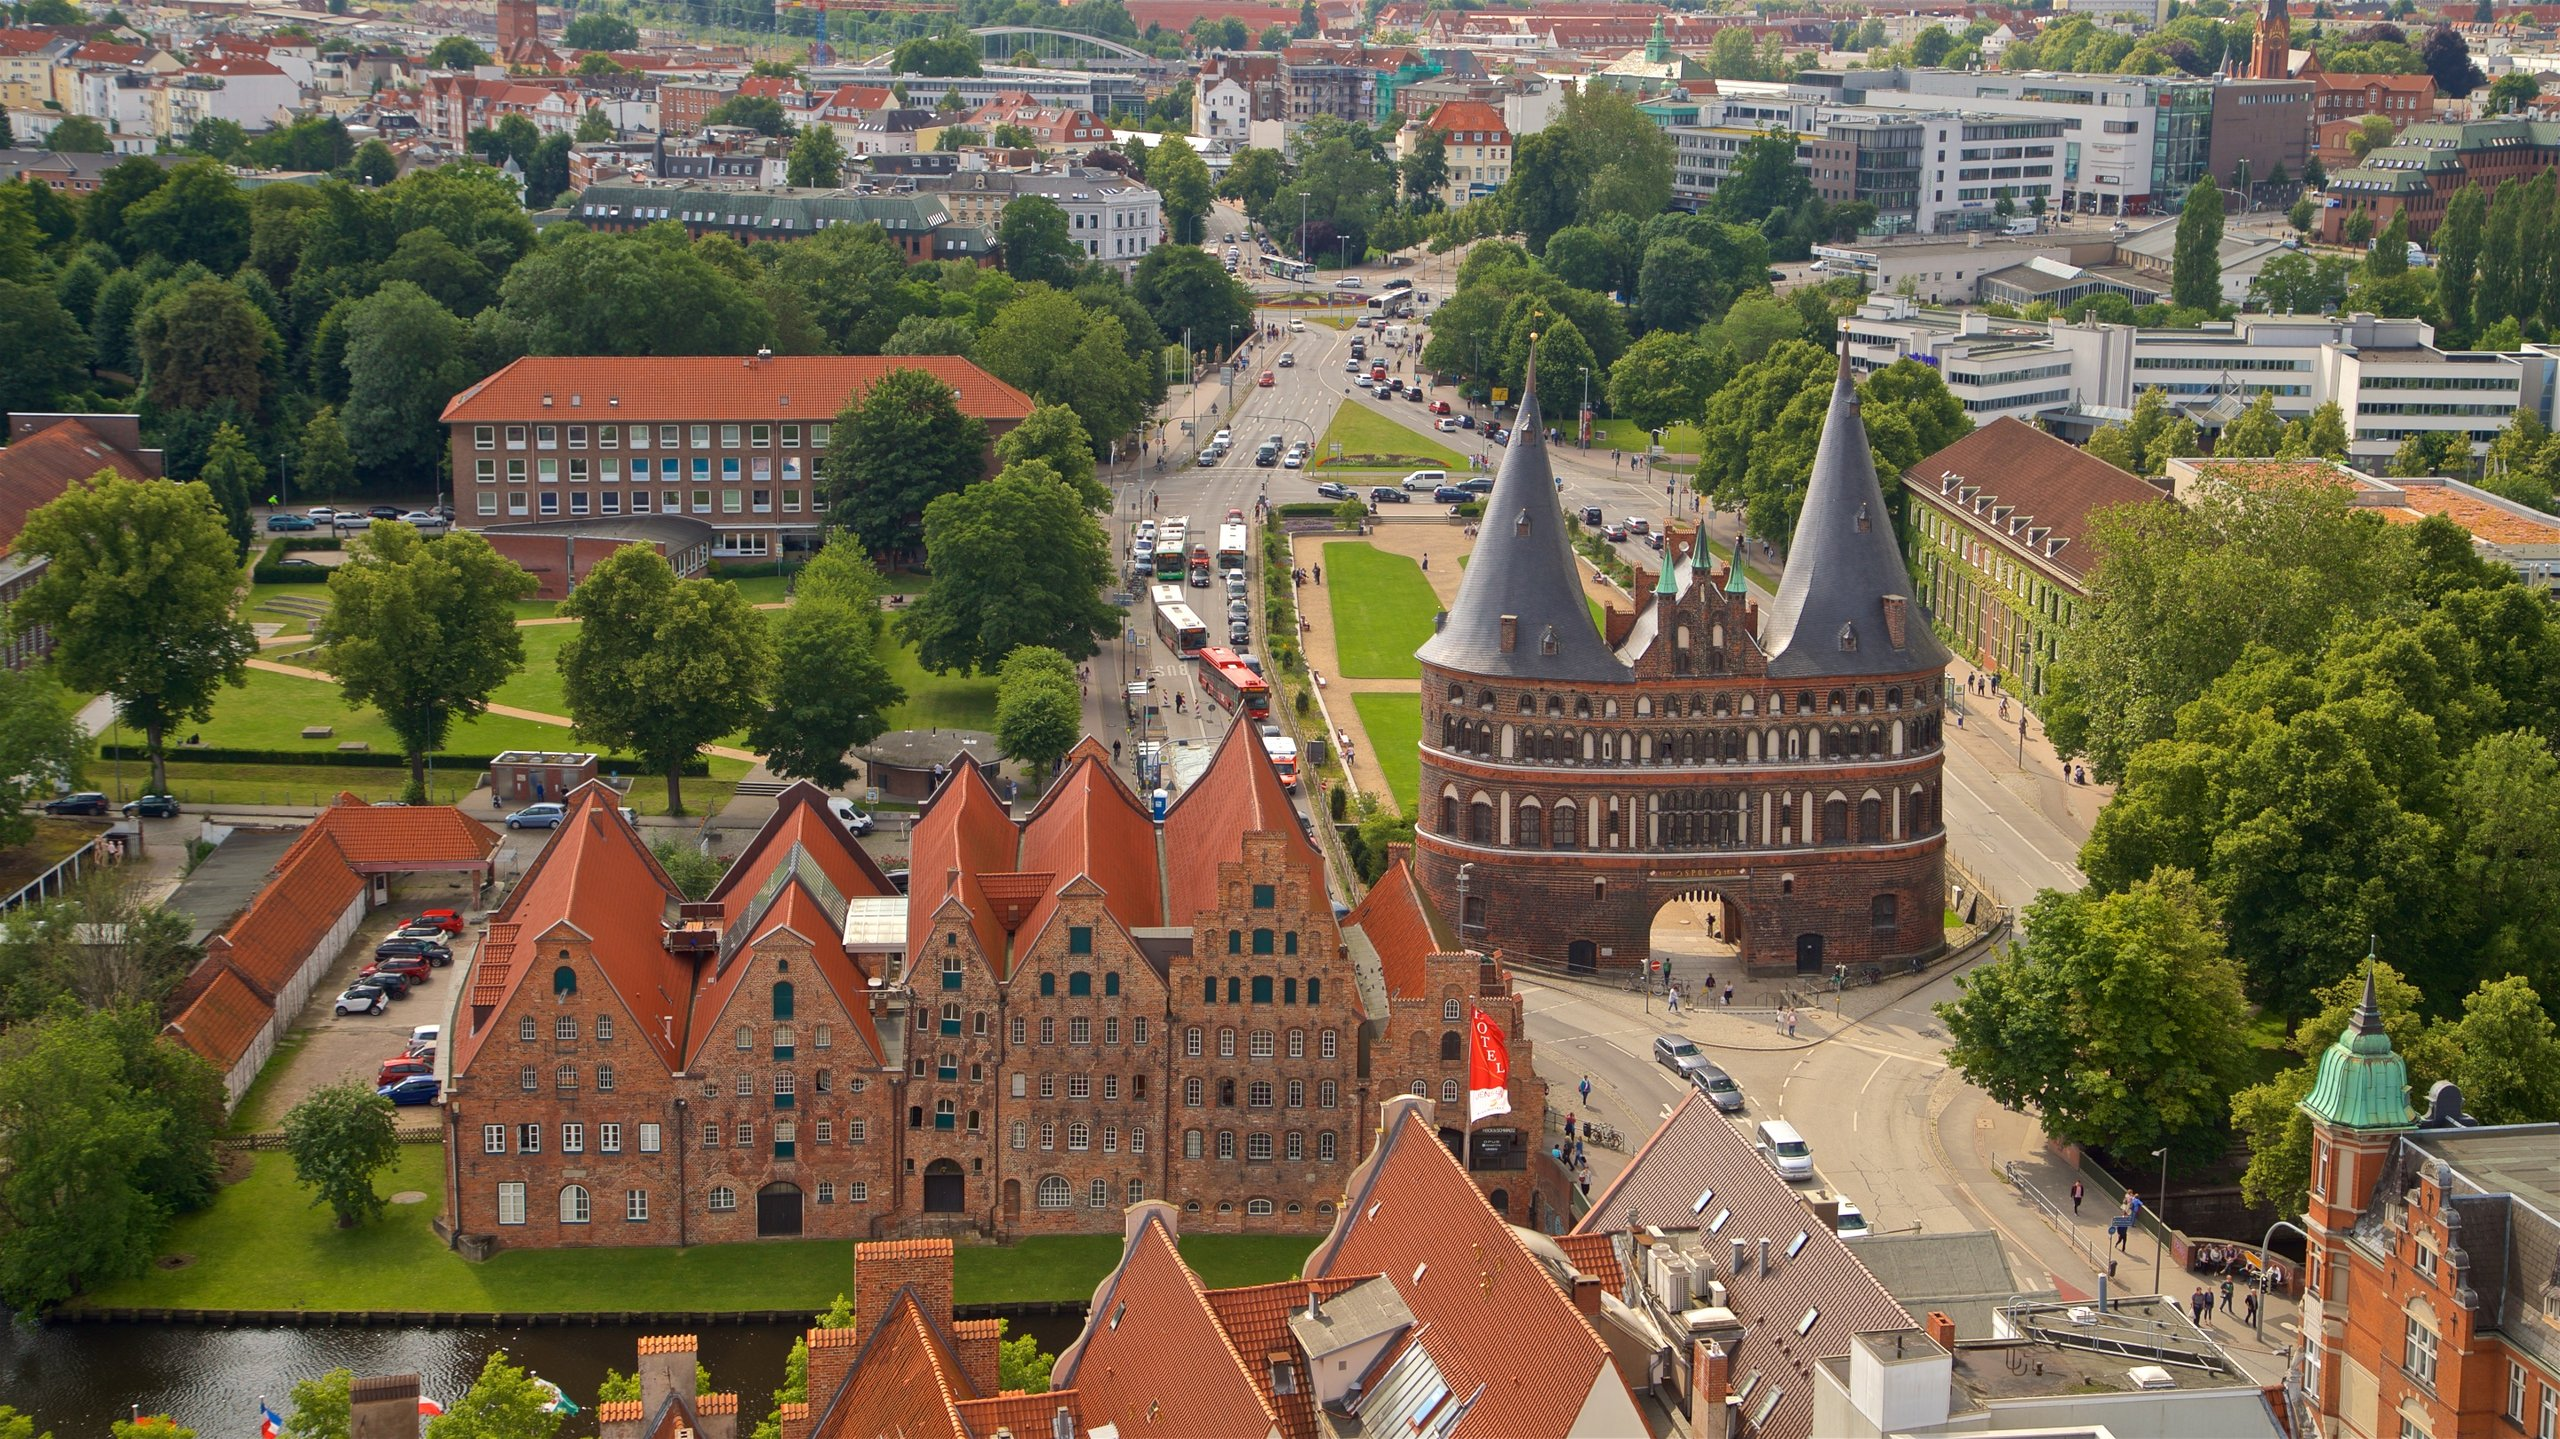 Luebeck Old Town, Lubeck, Schleswig-Holstein, Germany